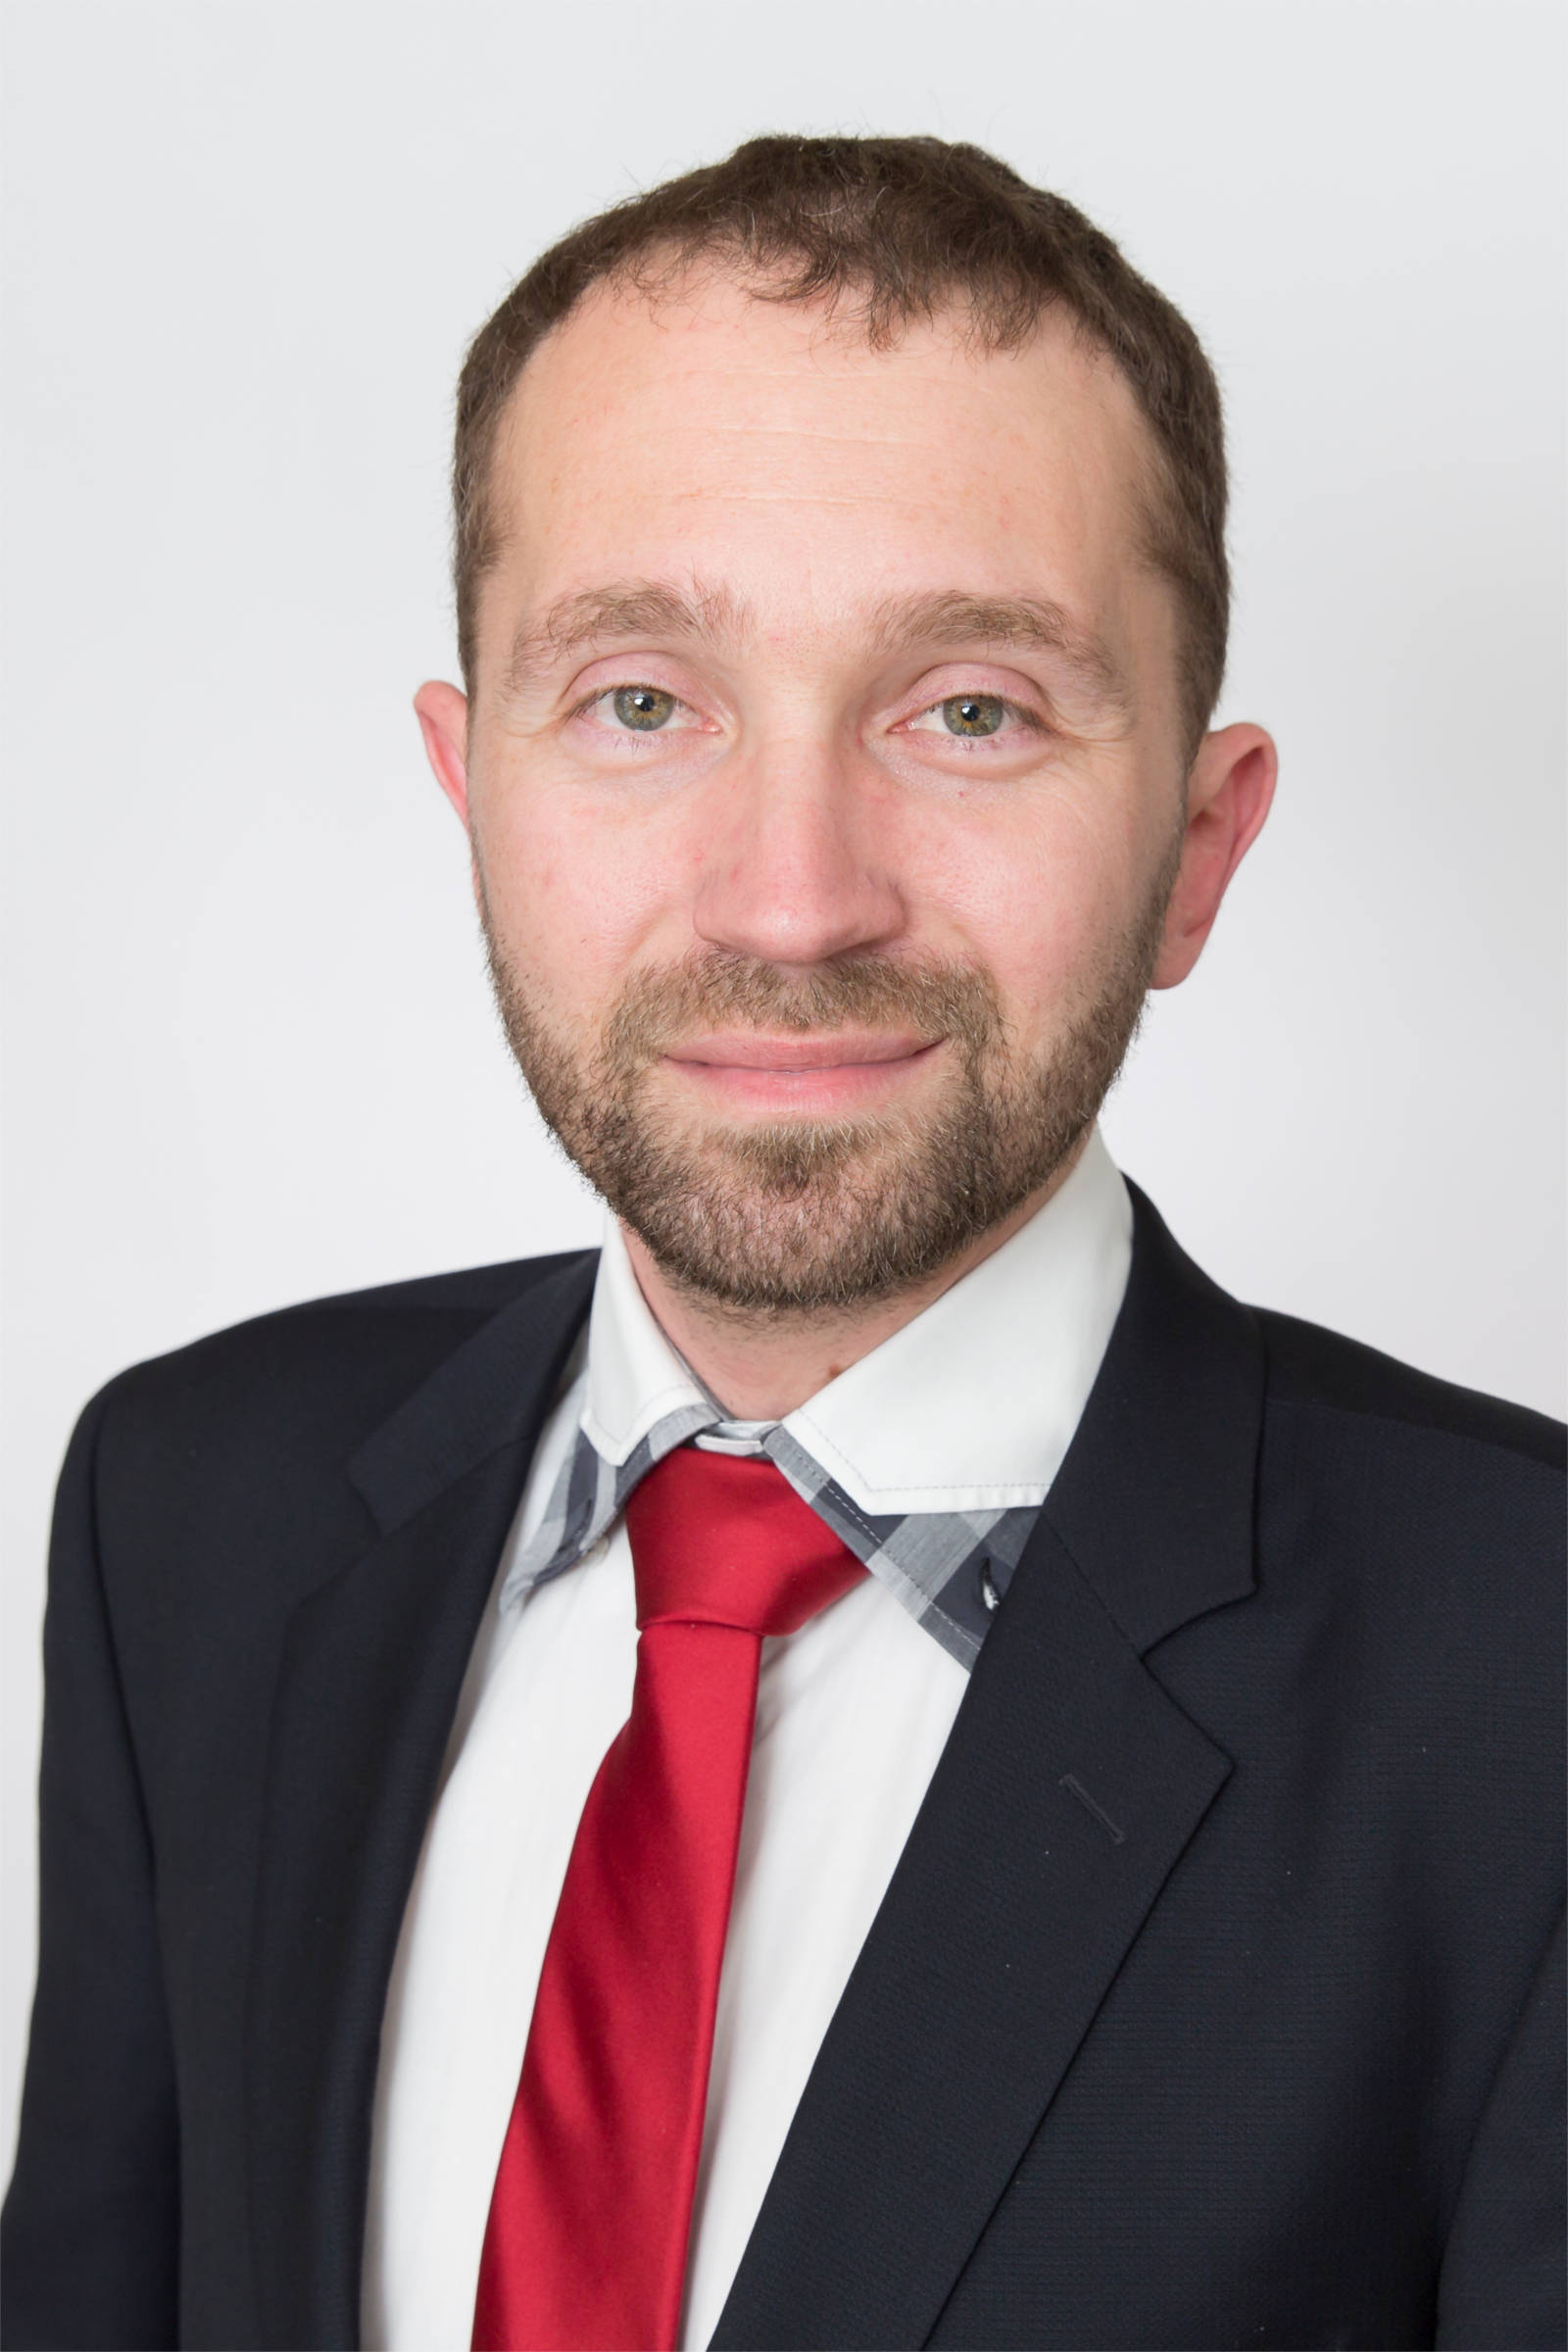 Christian Vockrodt